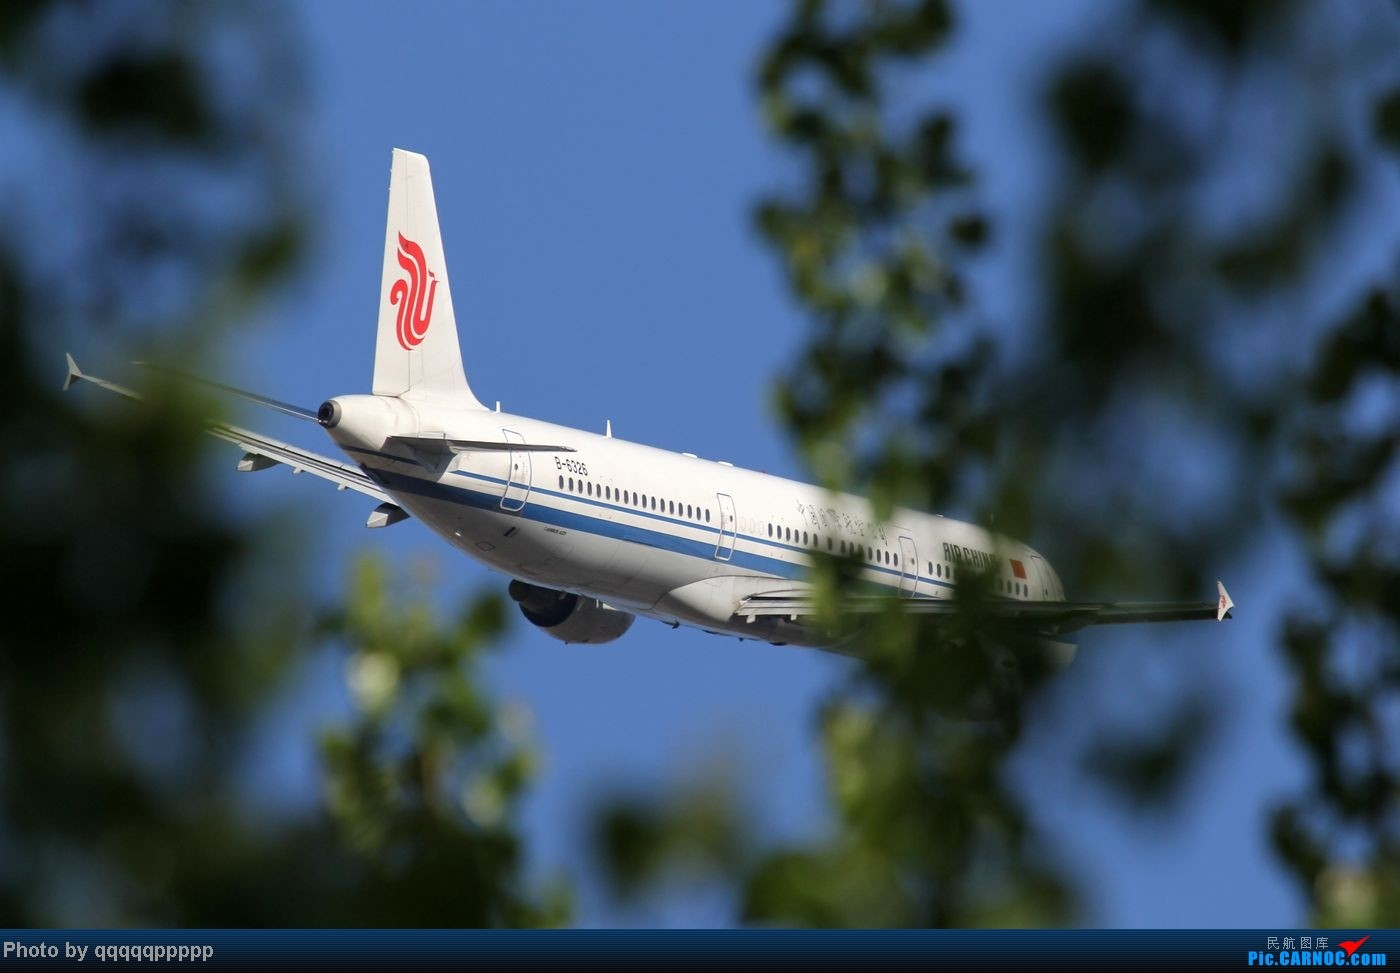 Re:[原创]五一小假期~北京迎来春暖花开的好天气。岂能错过这个拍机的好机会~ AIRBUS A321-200 B-6326 中国北京首都机场